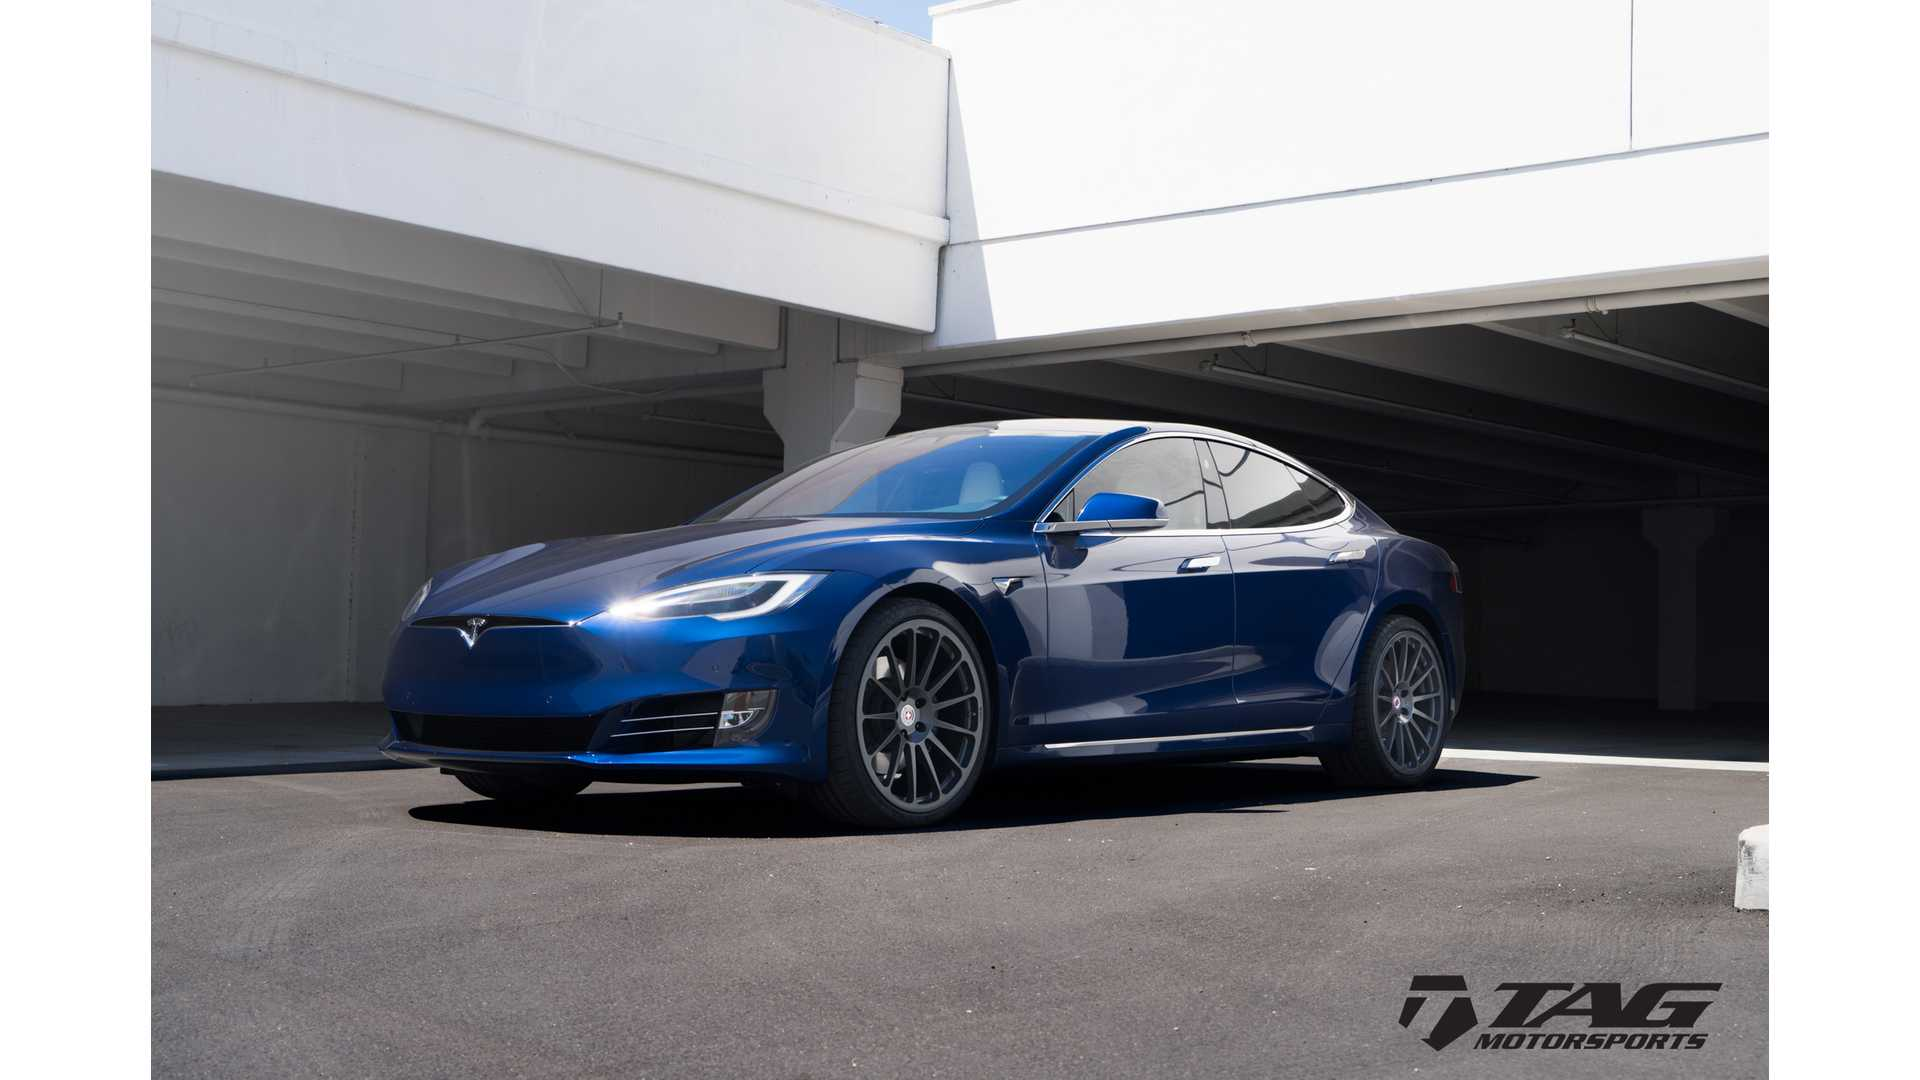 Tesla Model S Gets Aftermarket HRE Classic 303M Wheels